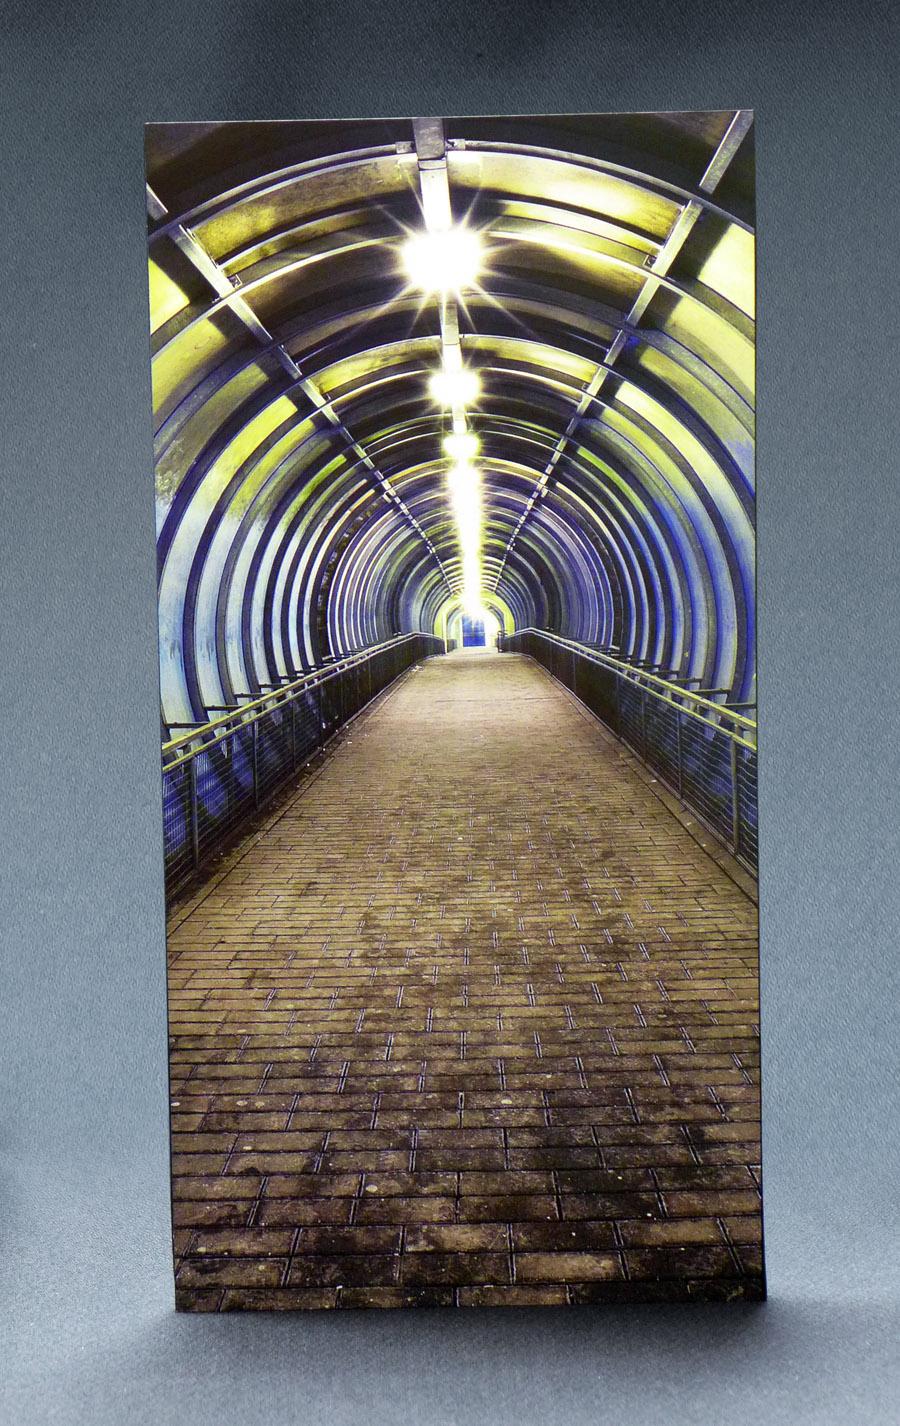 Spaceport Tunnel 1:6 Scale Striking Backdrop